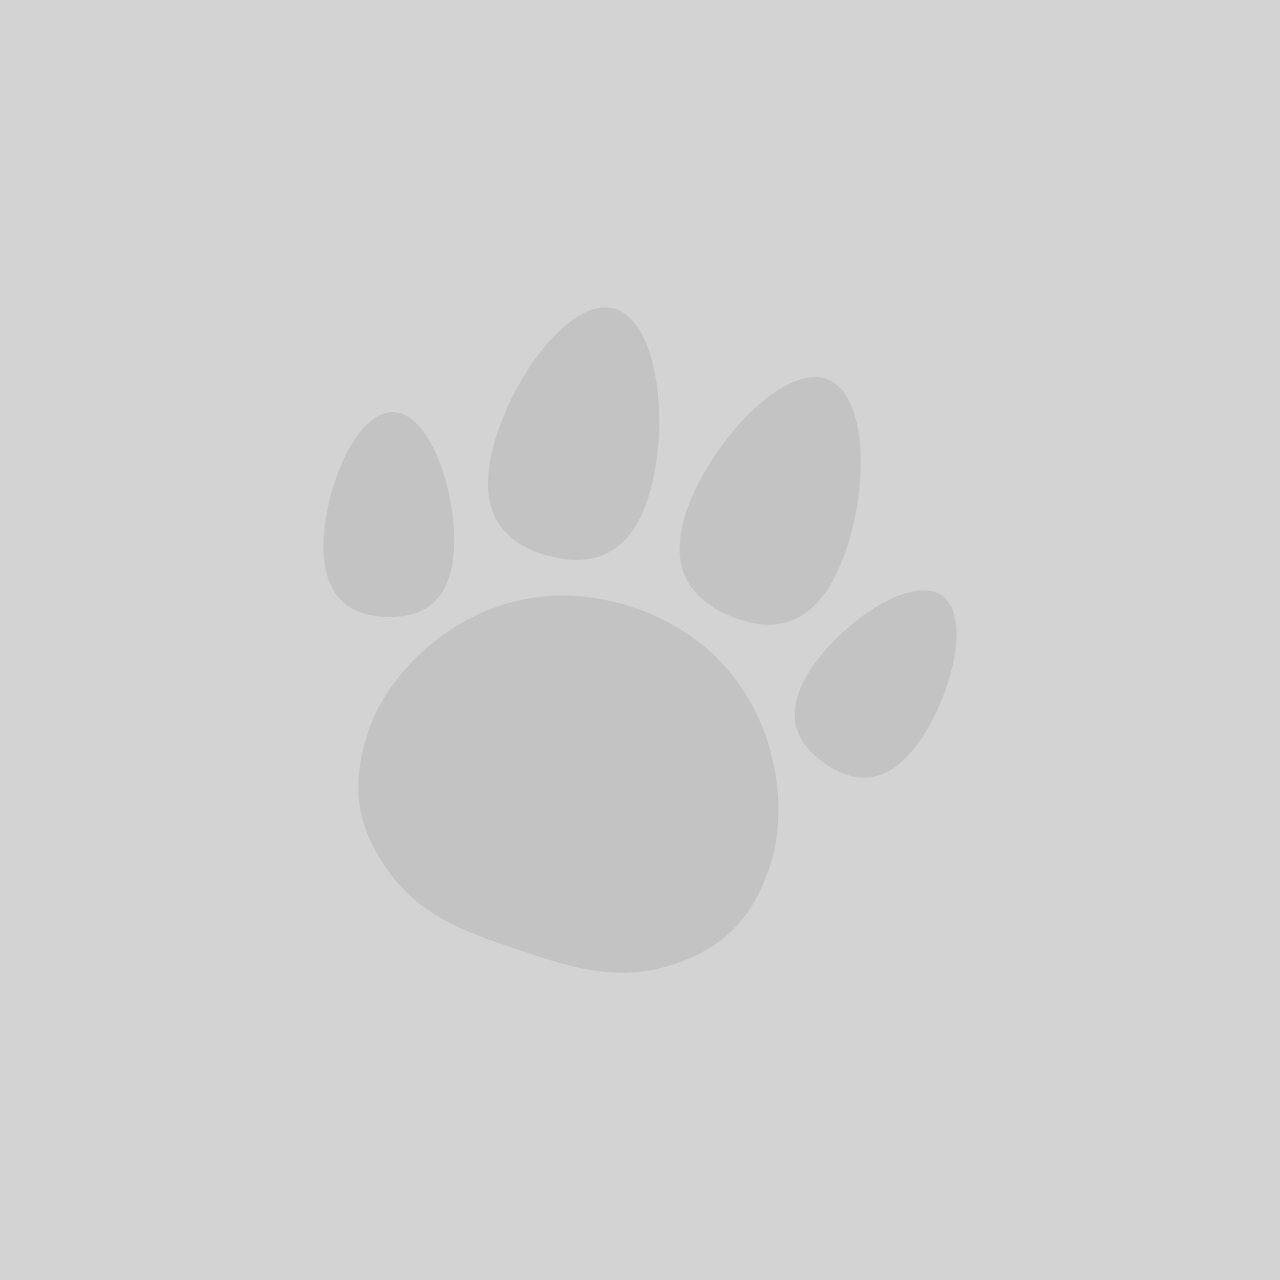 Pedigree Tasty Bites Dog Treats Chewy Cubes Mixed Variety